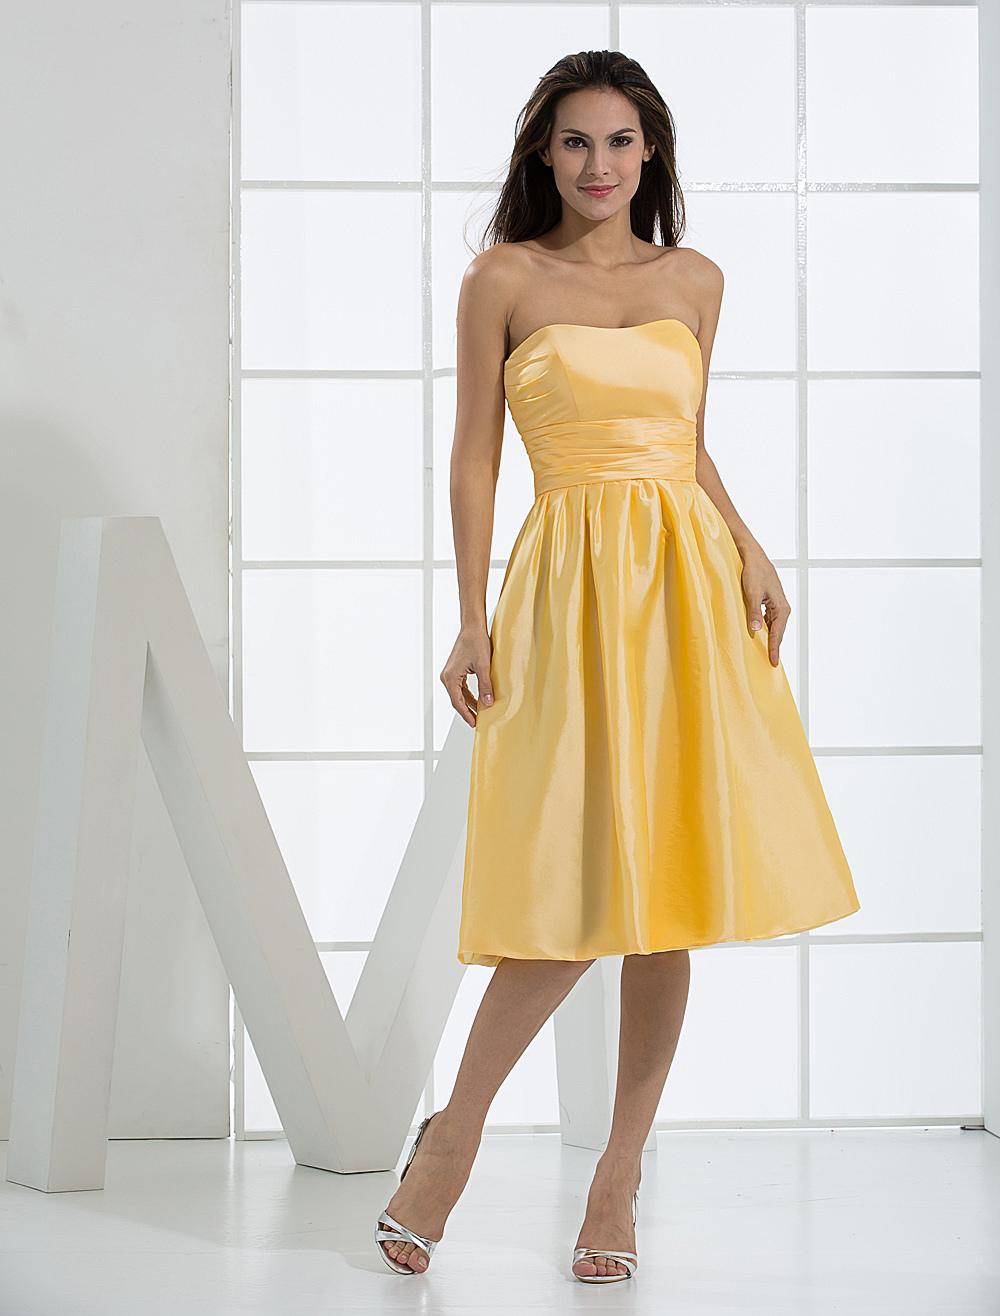 Strapless Wrapped Taffeta Homecoming Prom Dress